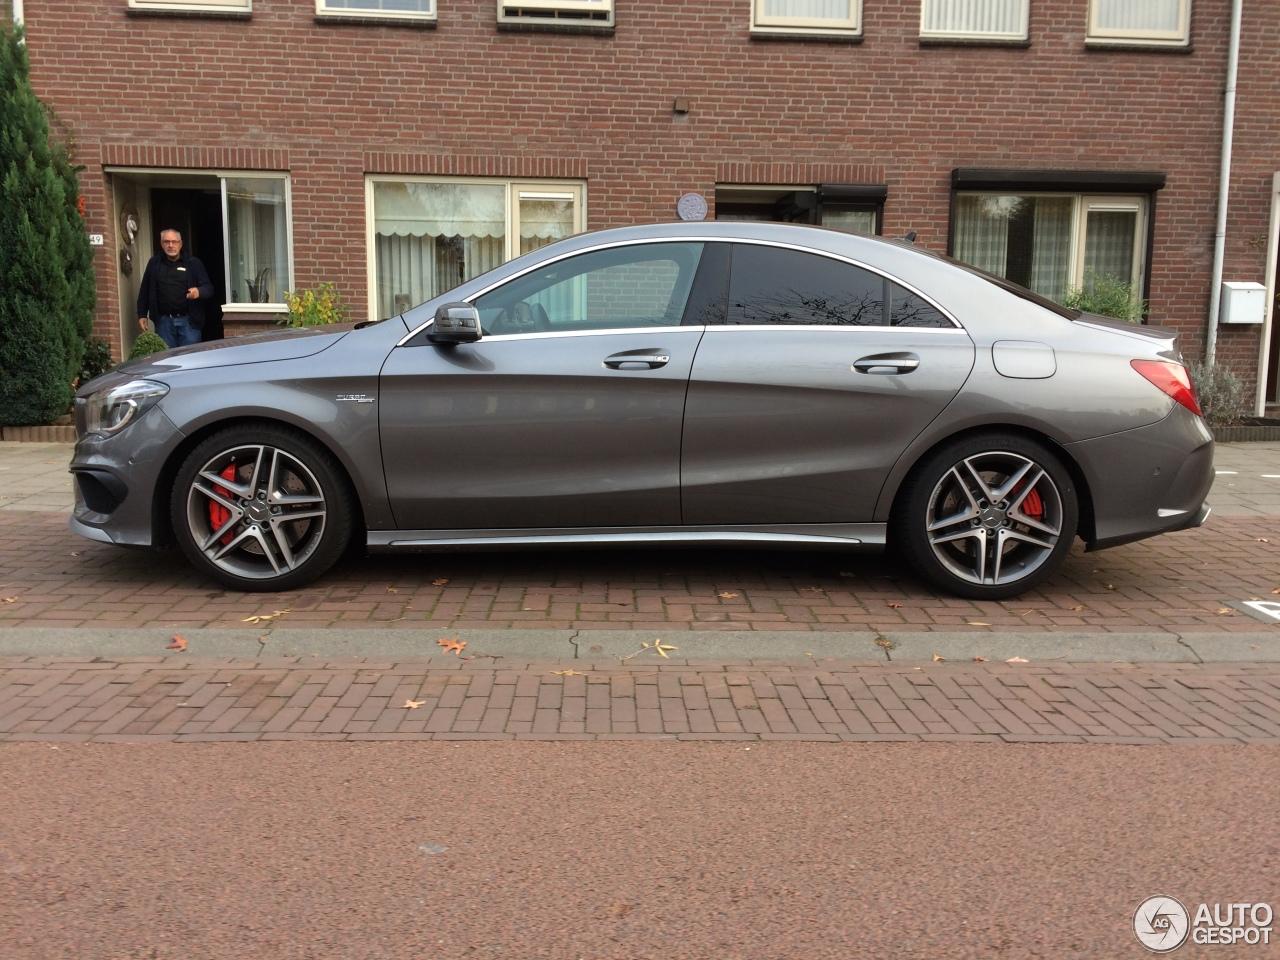 Mercedes benz cla 45 amg c117 4 november 2016 autogespot for Mercedes benz cla 250 amg price